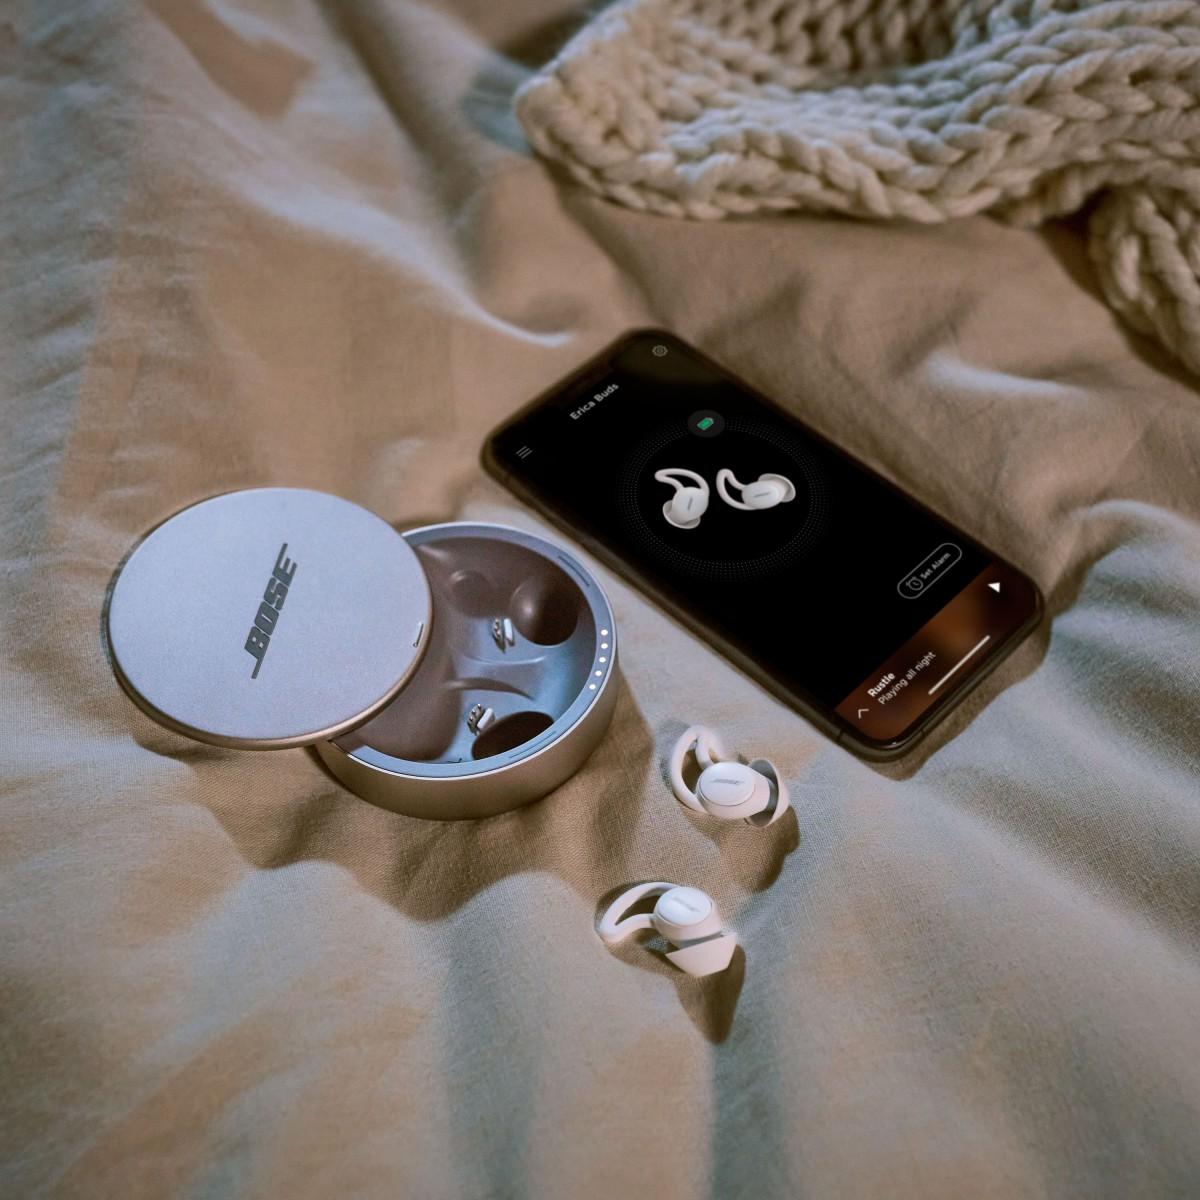 Bose SleepBuds II: MUSTHAVE